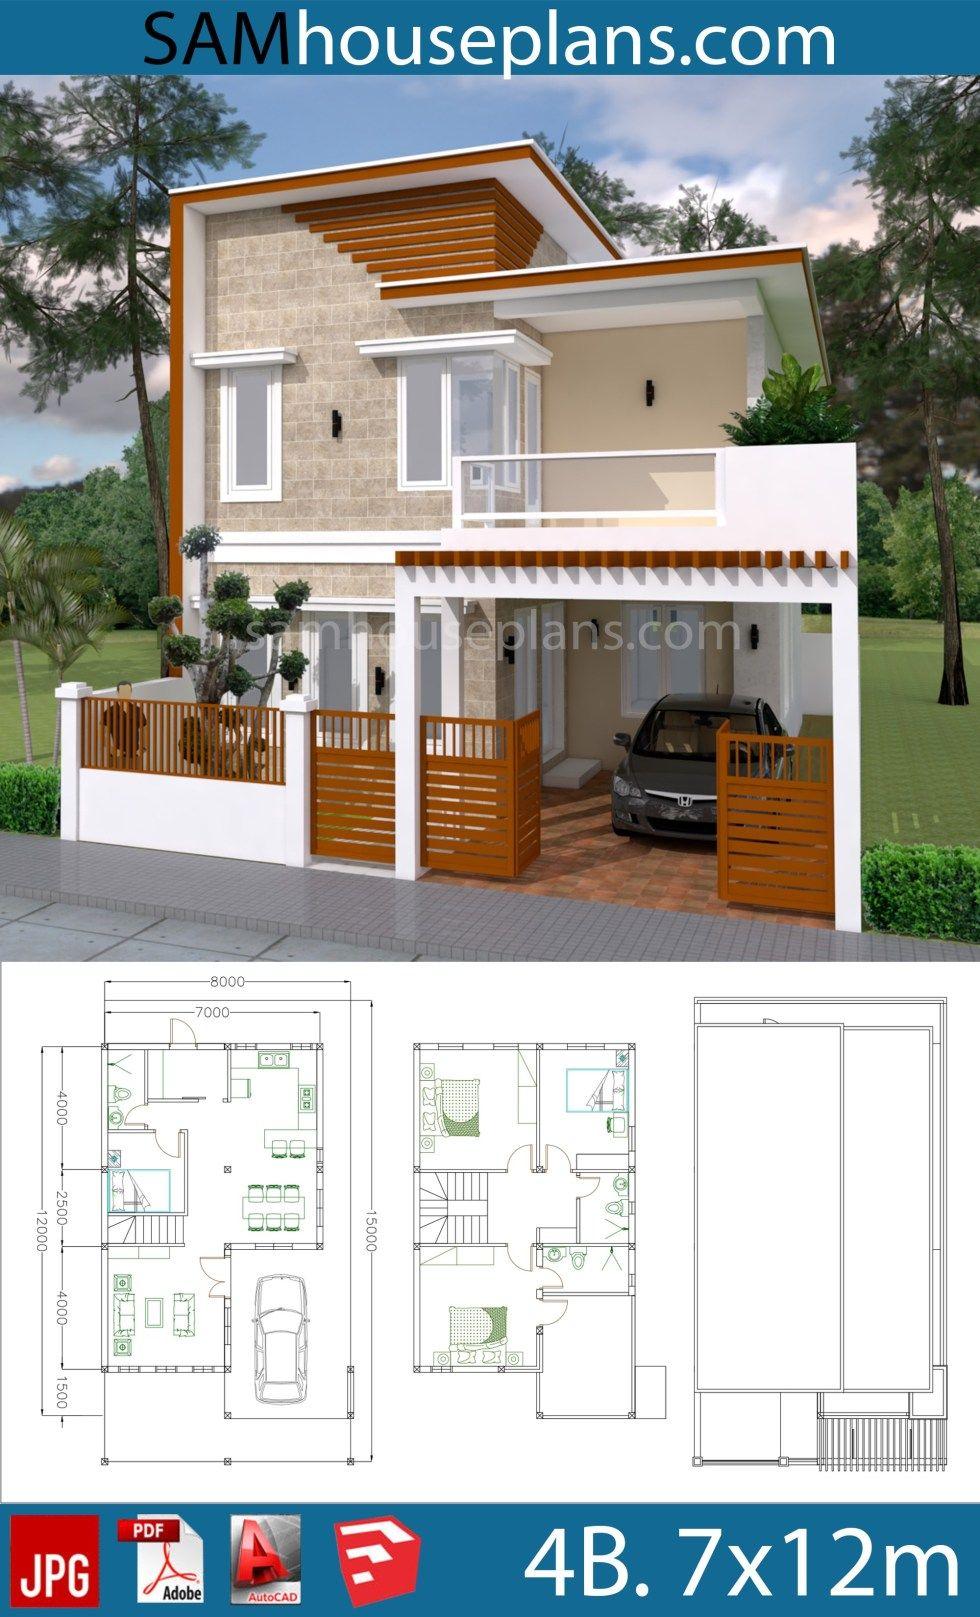 House Plans 7x12m With 4 Bedrooms Plot 8x15 Sam House Plans Model House Plan Architectural House Plans Duplex House Plans